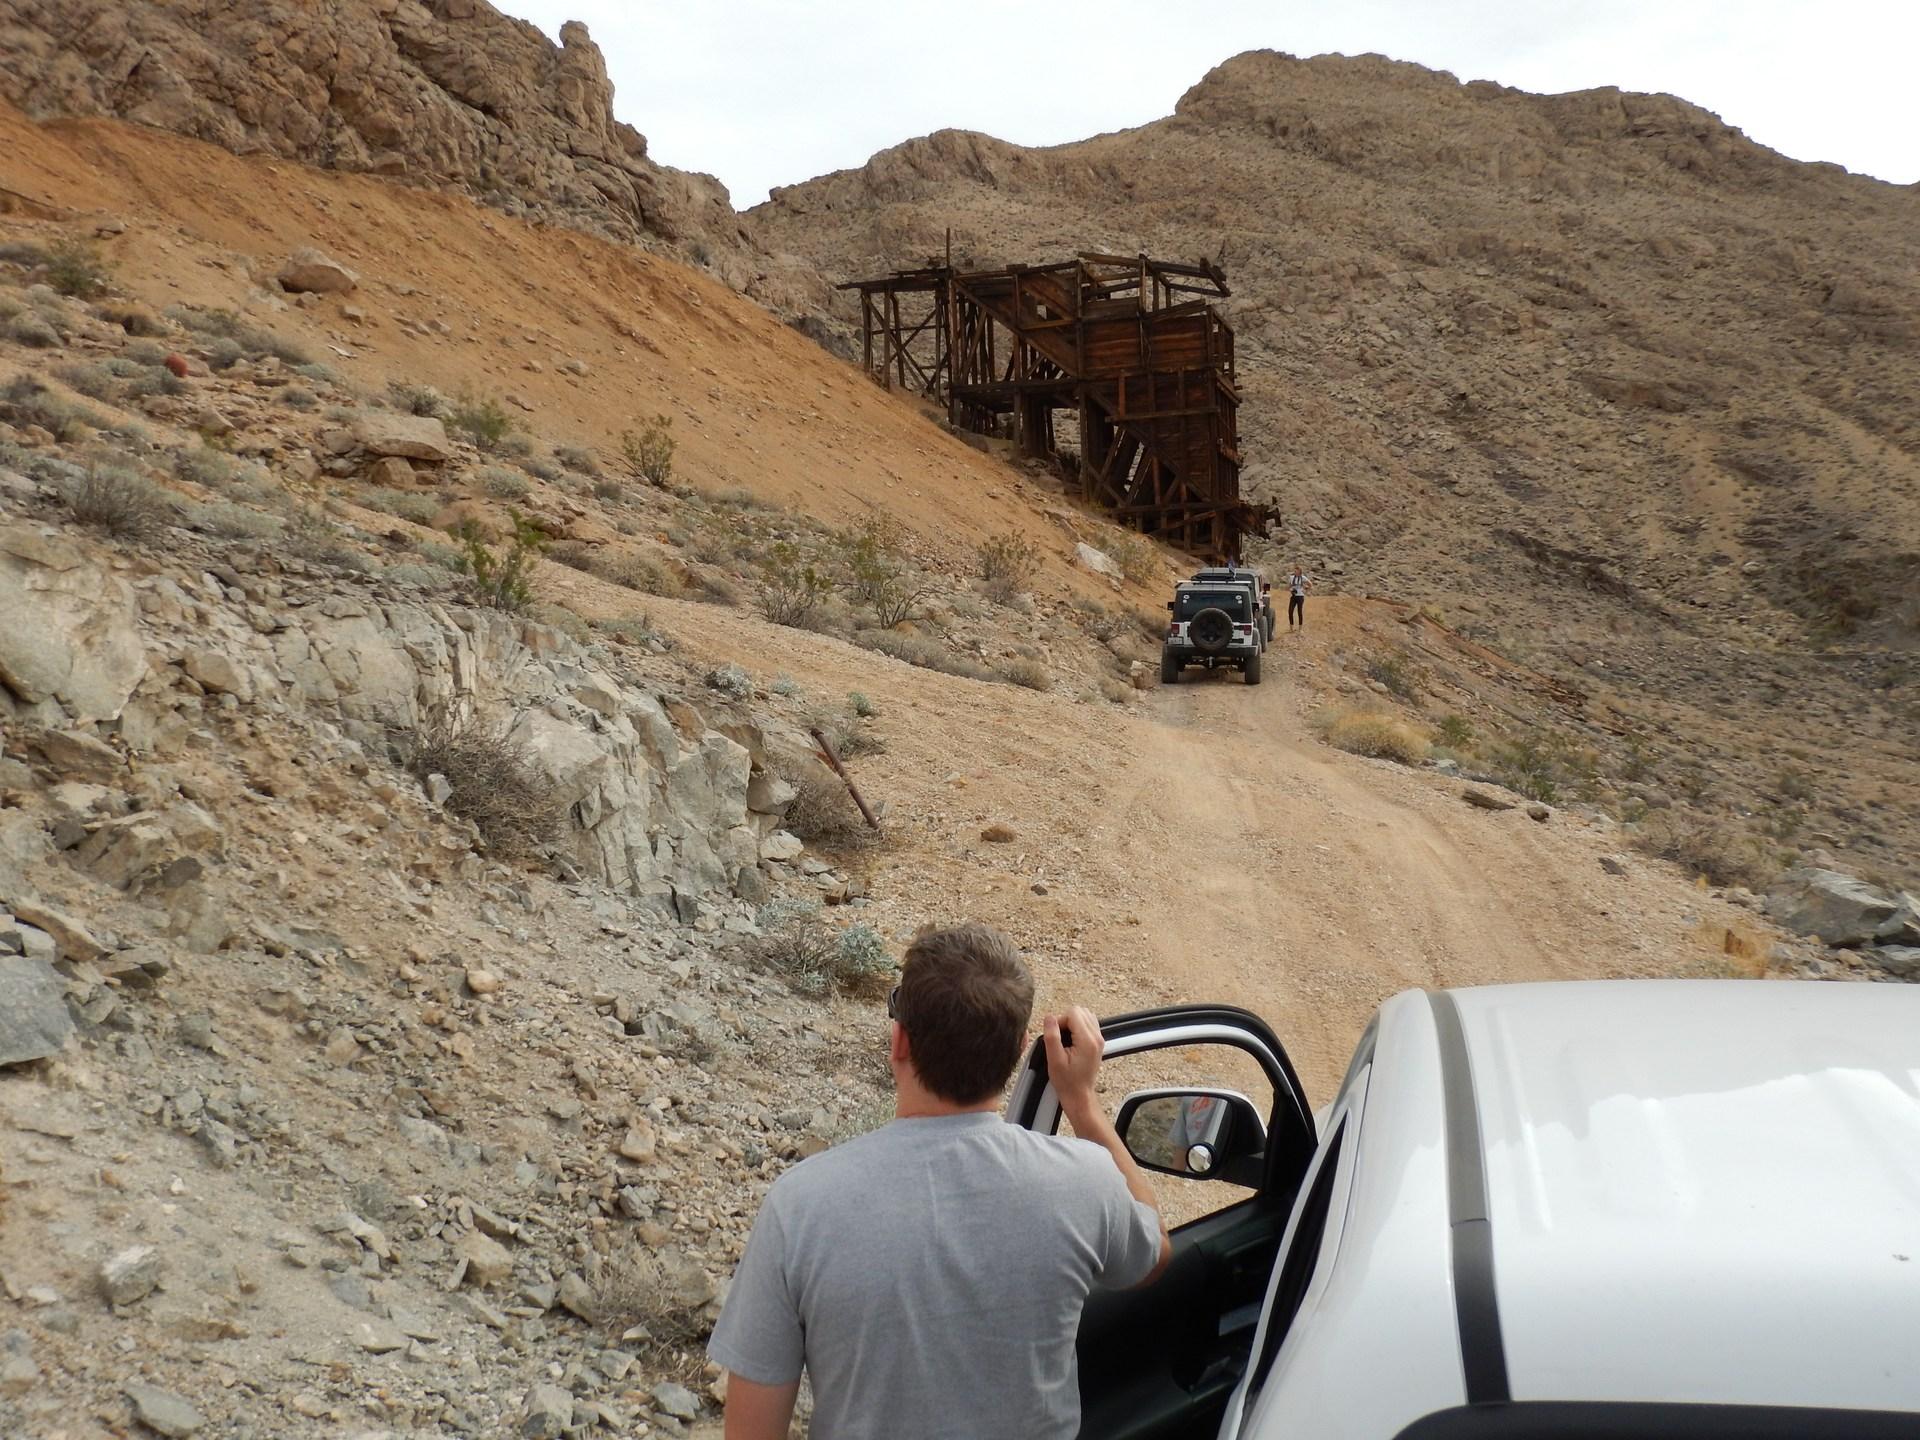 War Eagle Mine, Tecopa, CA